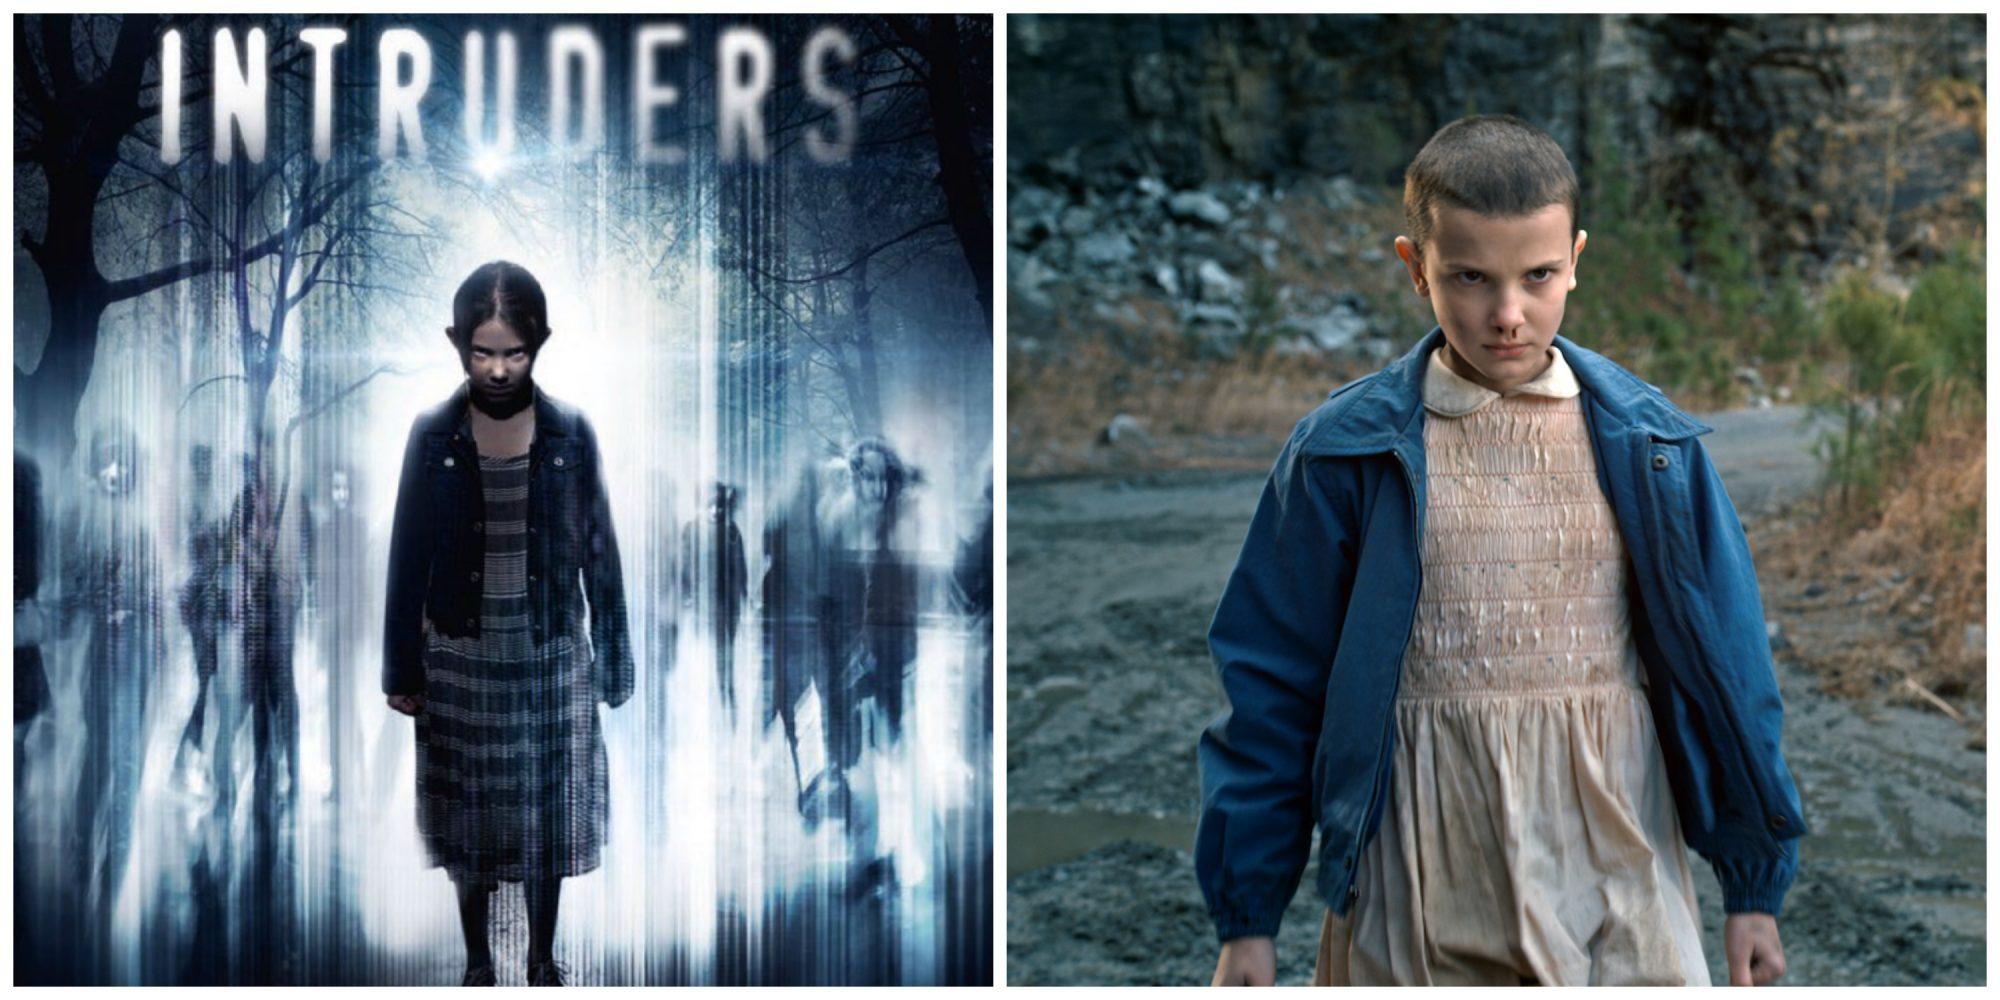 eleven-intruders